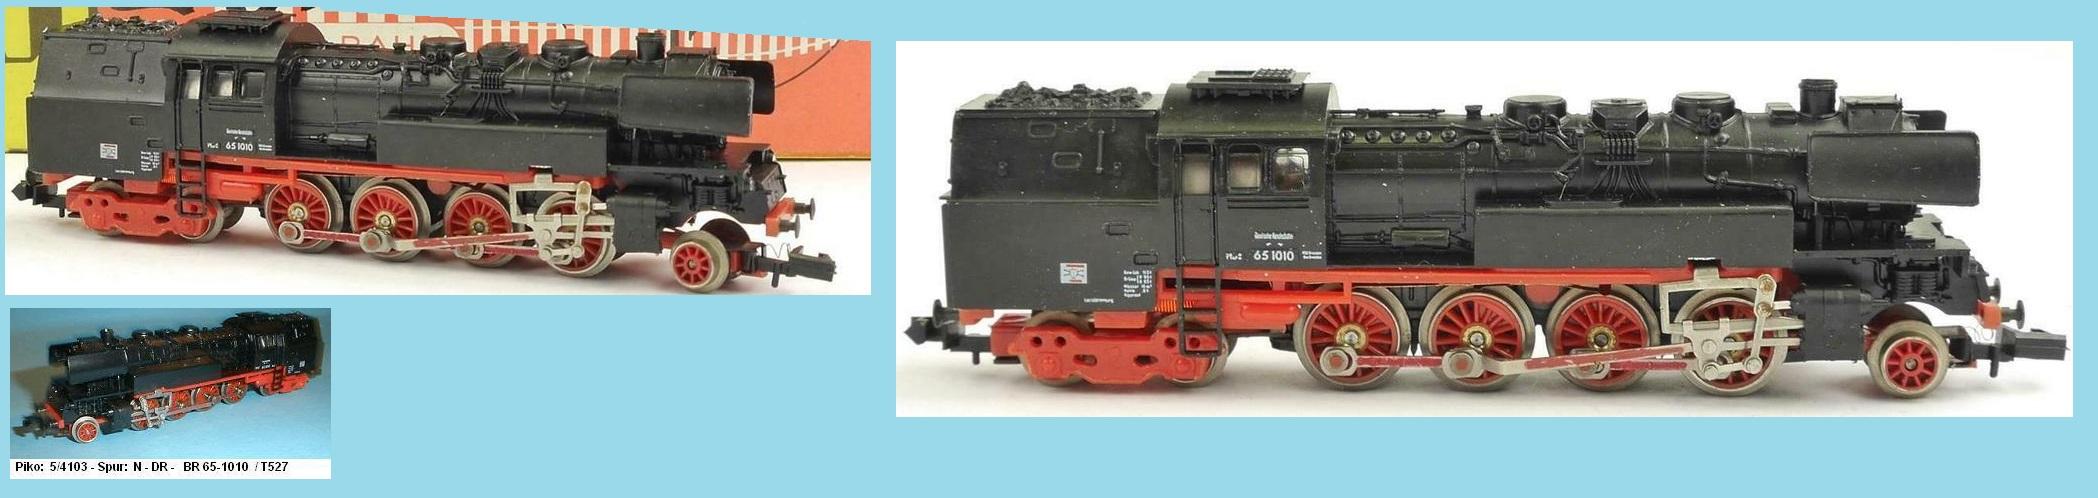 Dampflok-Br65-N